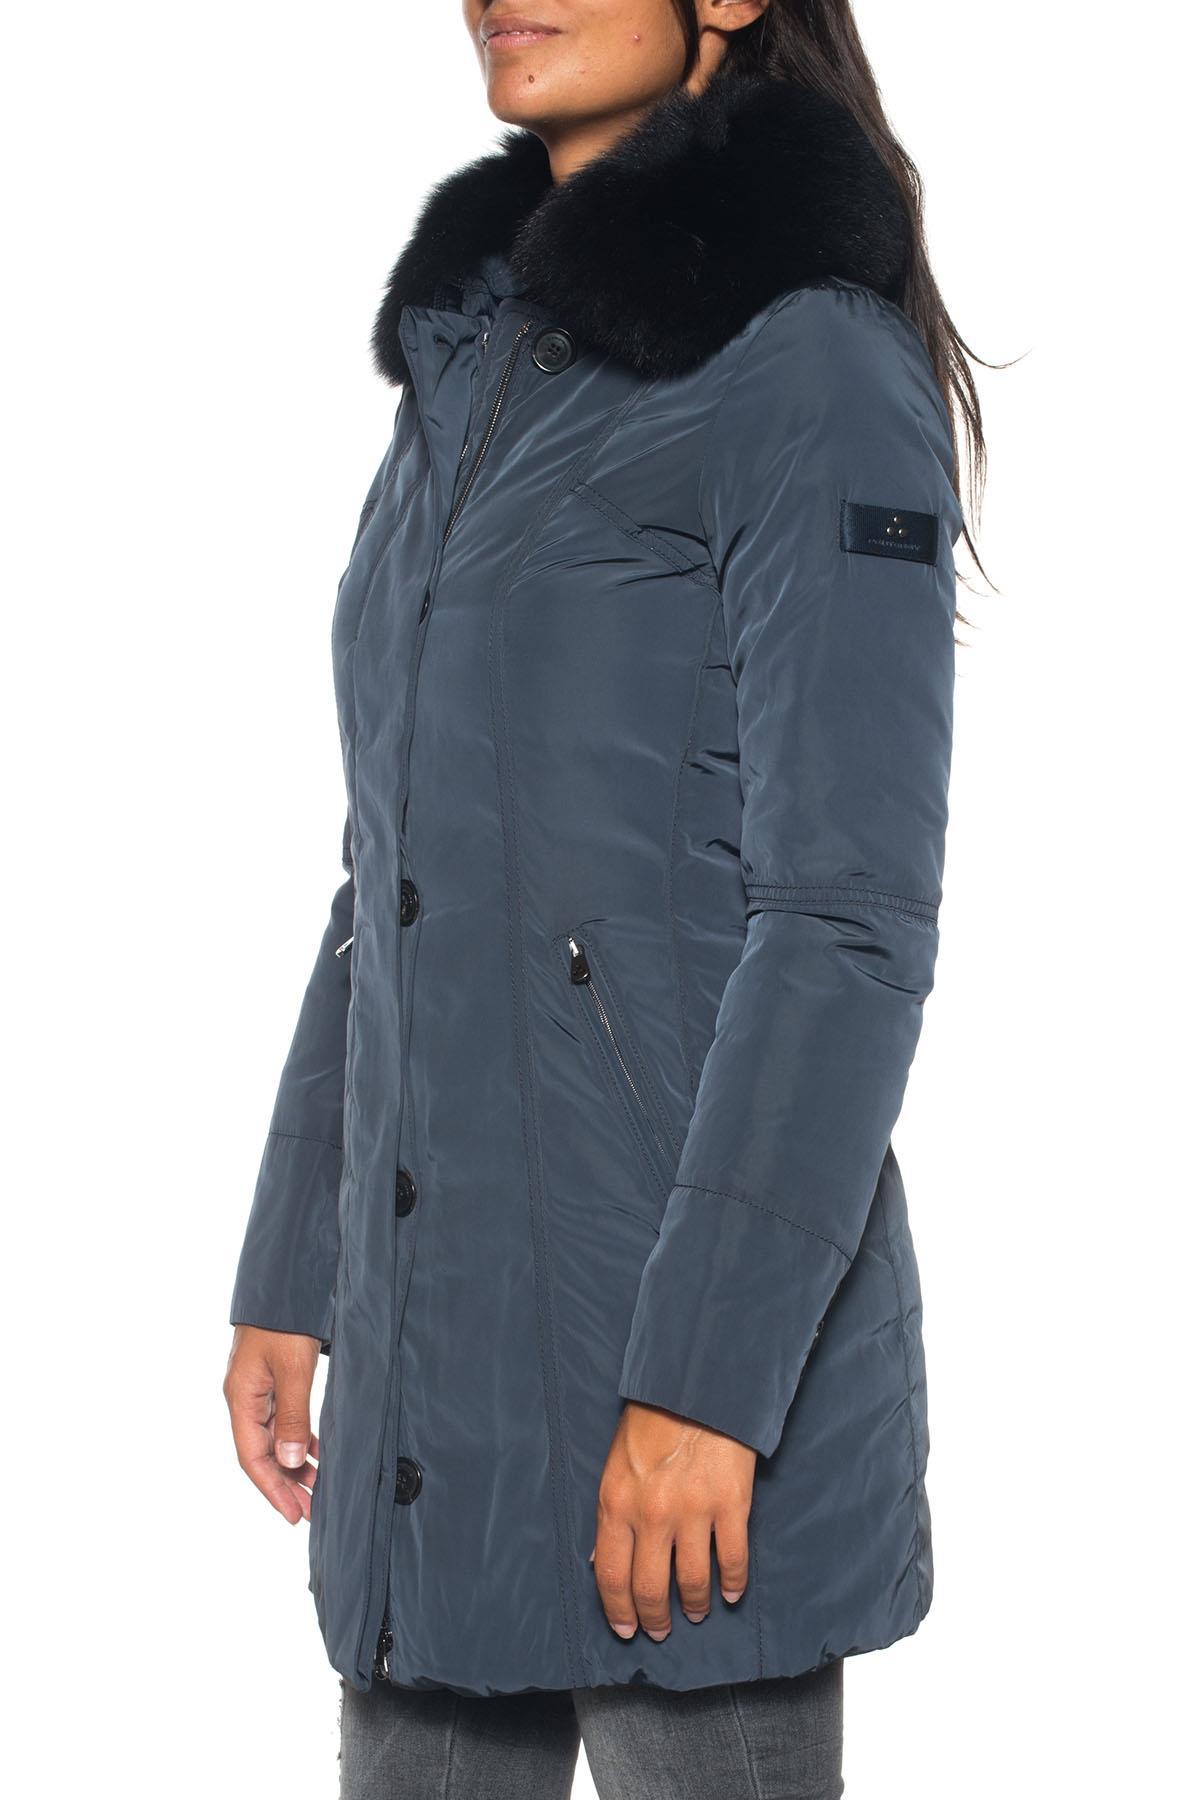 detailed look e9cca c0038 Giaccone Metropolitan GB Fur